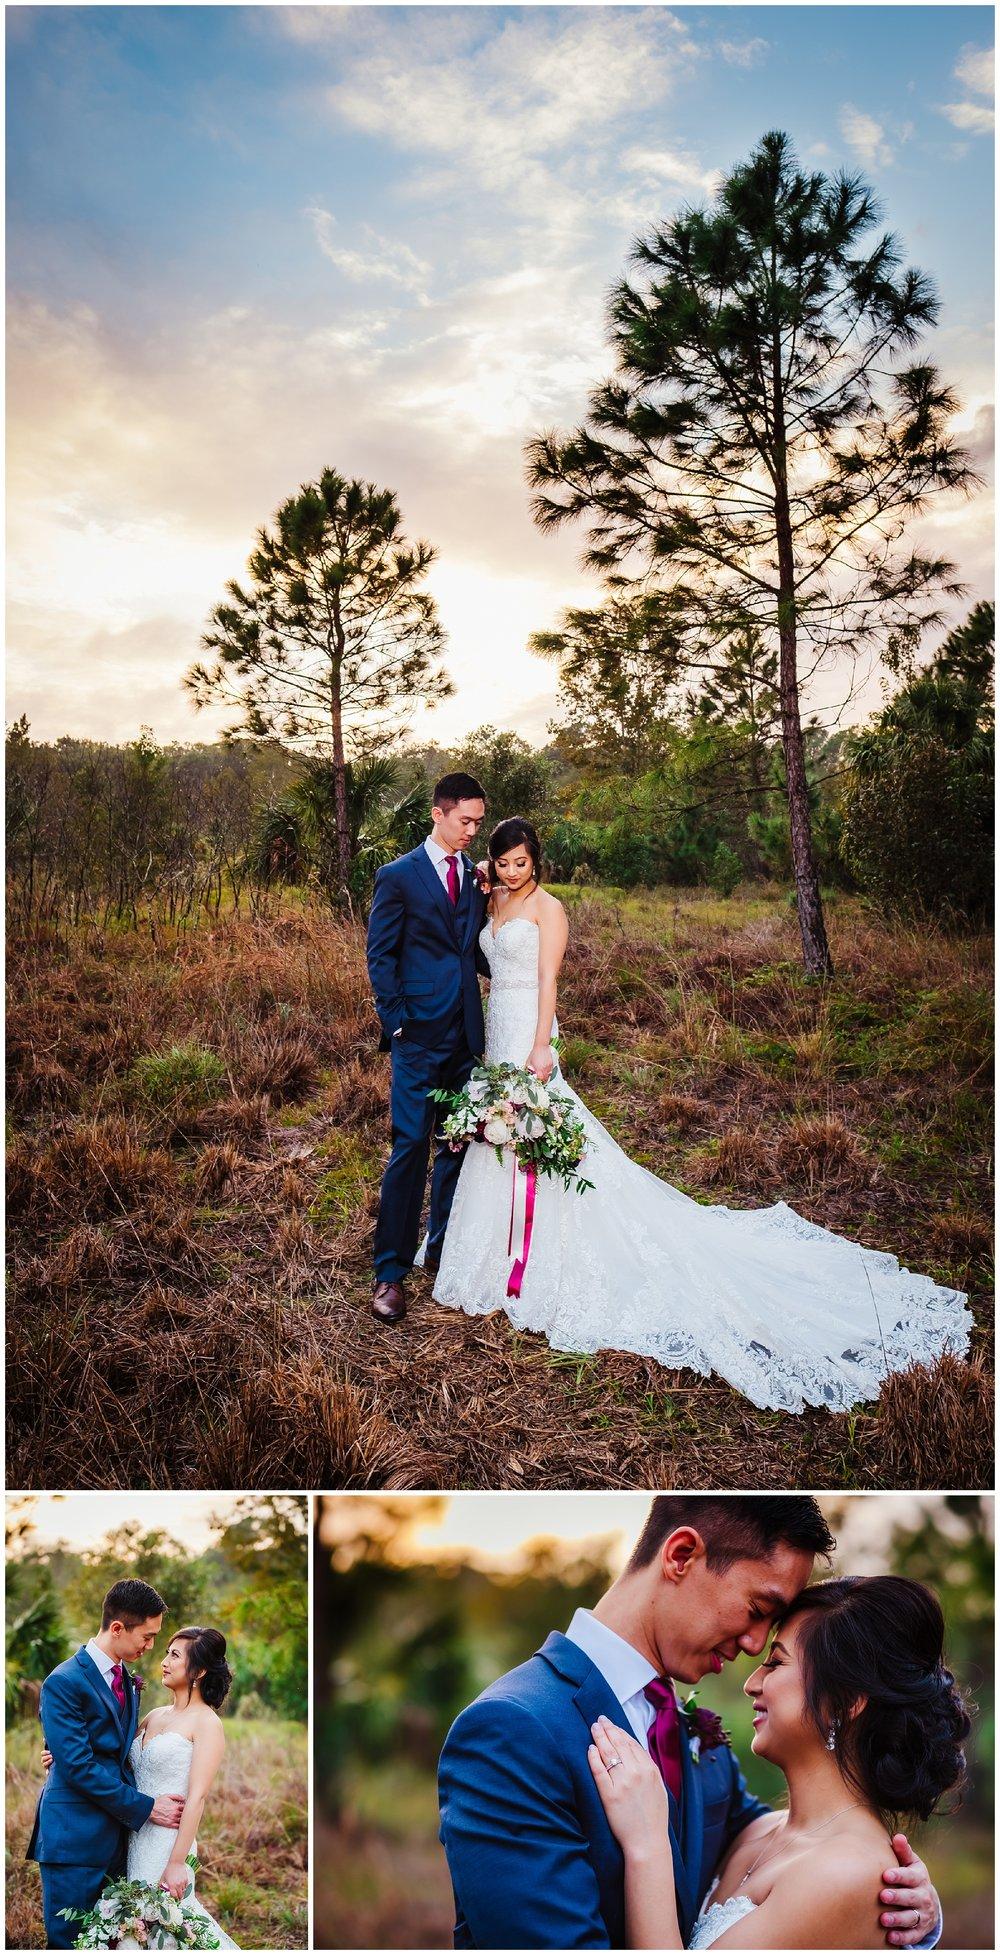 tampa-wedding-photographer-philipino-colorful-woods-ballroom-church-mass-confetti-fuscia_0053.jpg